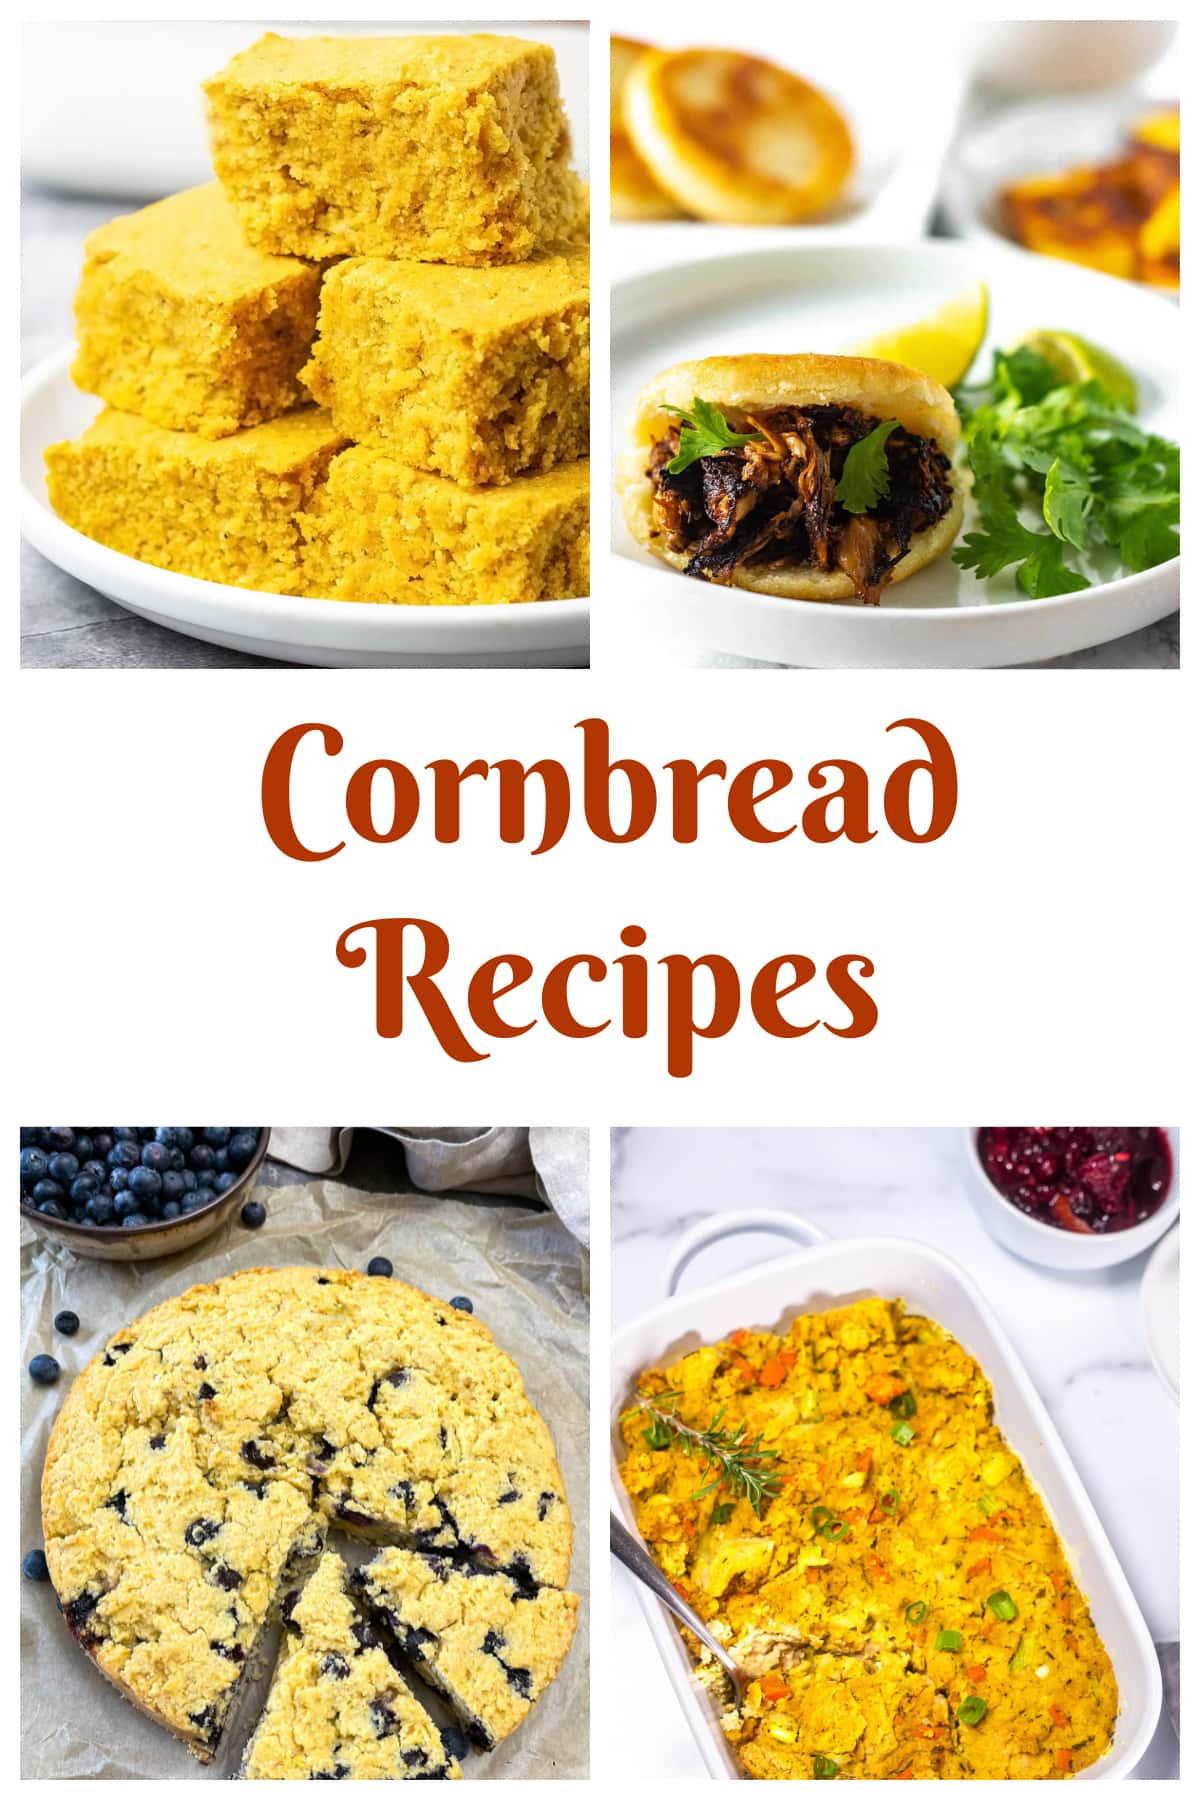 My Favorite Cornbread Recipes